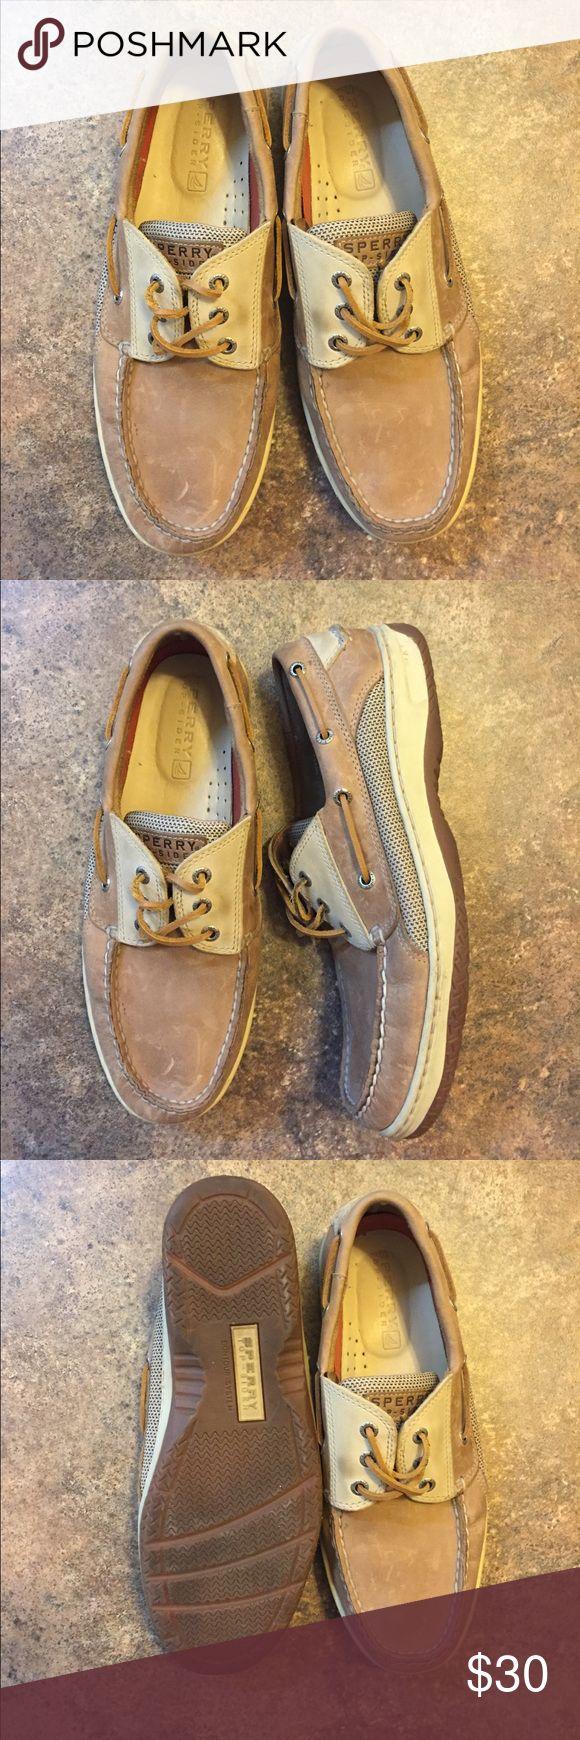 Sorry top siders, Men Tan speedy slip on/loafers men shoes. Gently worn. Like new. Very very comfortable. Sperry Top-Sider Shoes Flats & Loafers